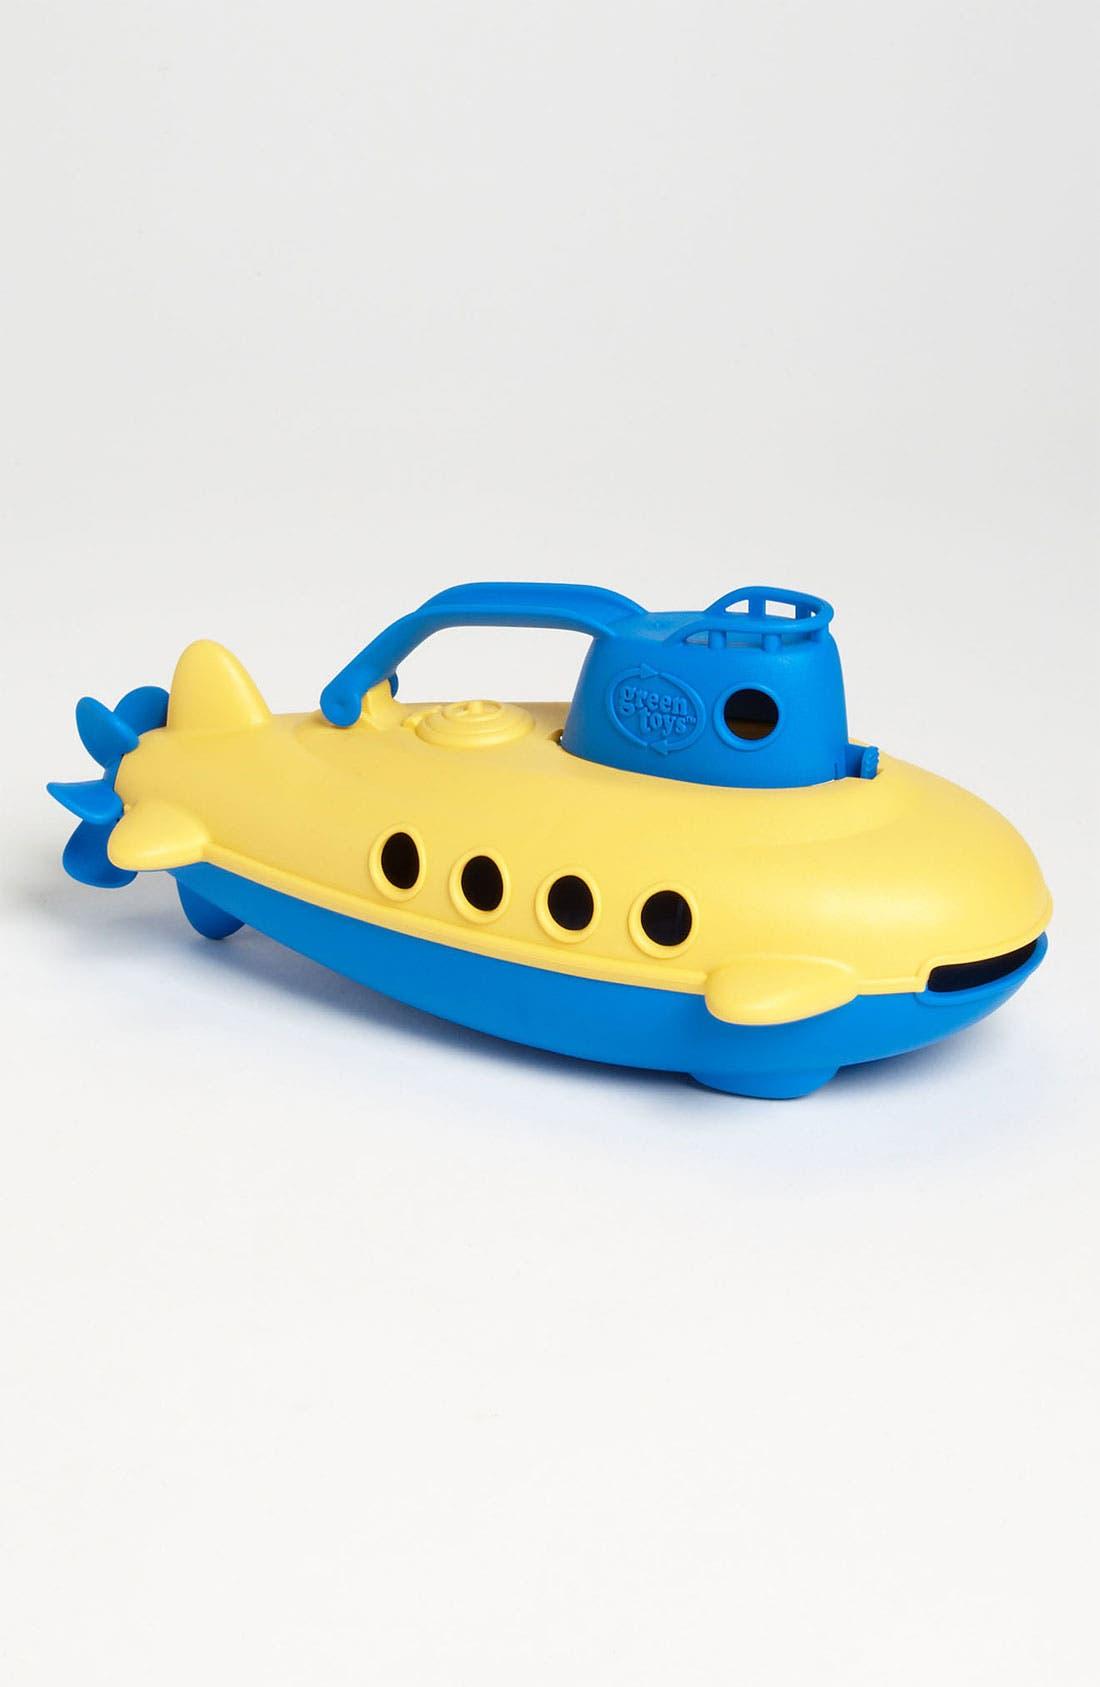 Submarine Bath Toy,                             Main thumbnail 1, color,                             400